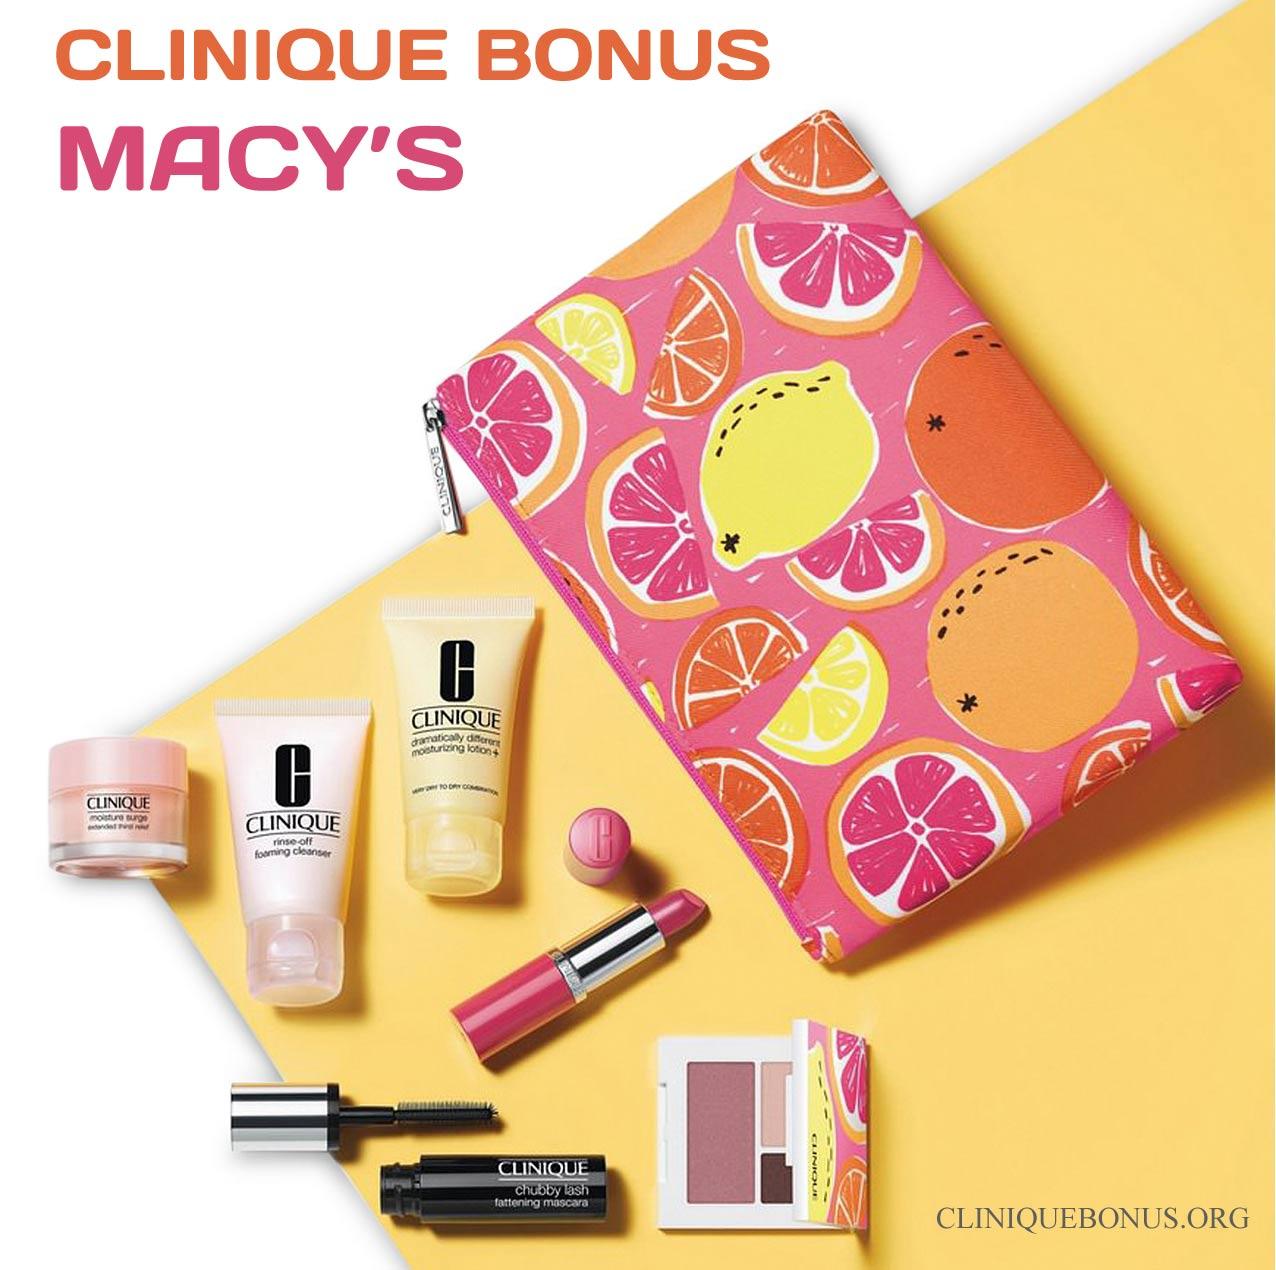 NEW Clinique 7pc Skincare Makeup Gift Set NEUTRAL Foundation, Smart Custom-Repair Serum & More! ($75 Value).